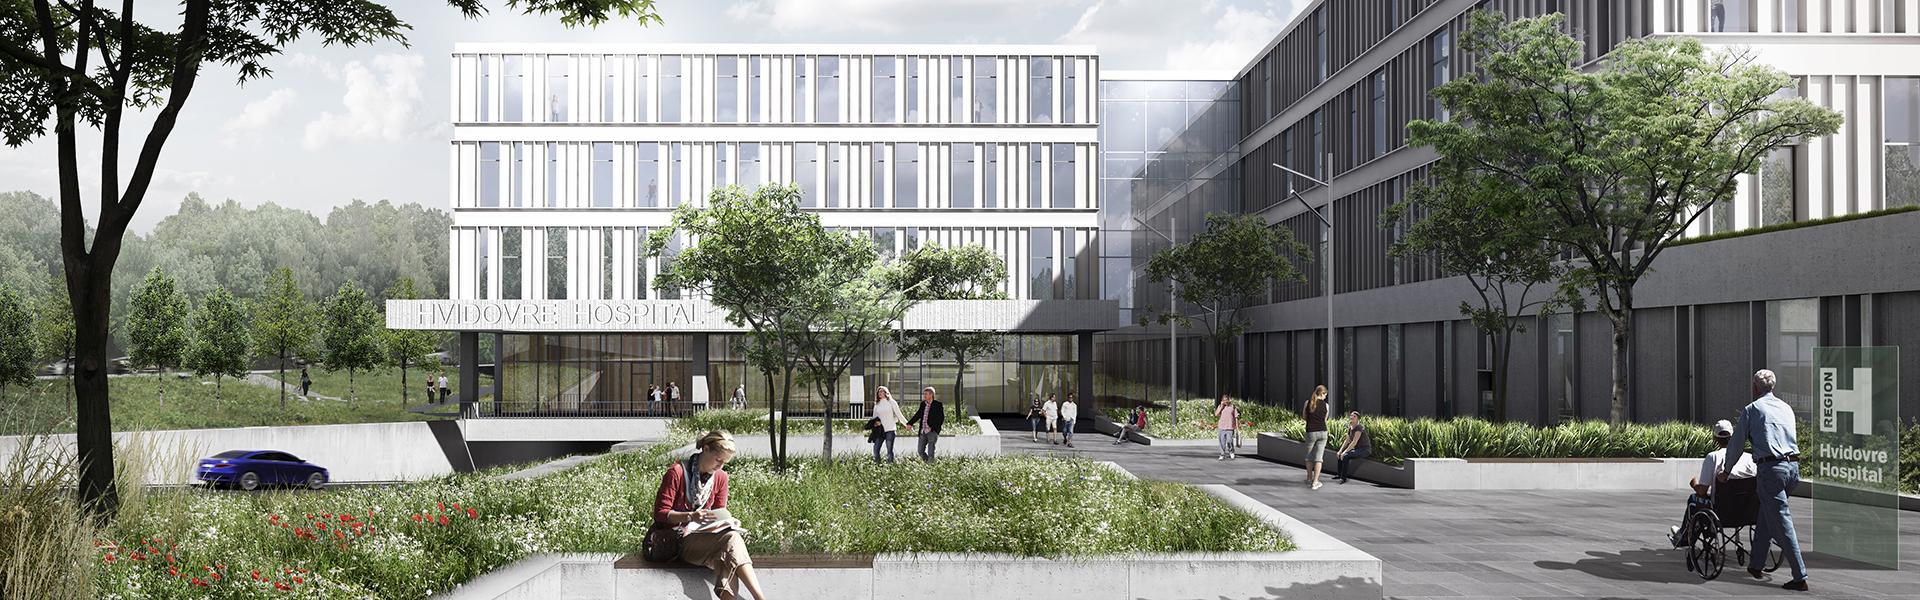 NYT HOSPITAL HVIDOVRE    32.000 m2   2009-2019   Ca. 1,45 mia. kr.   Bygherre: Region Hovedstaden